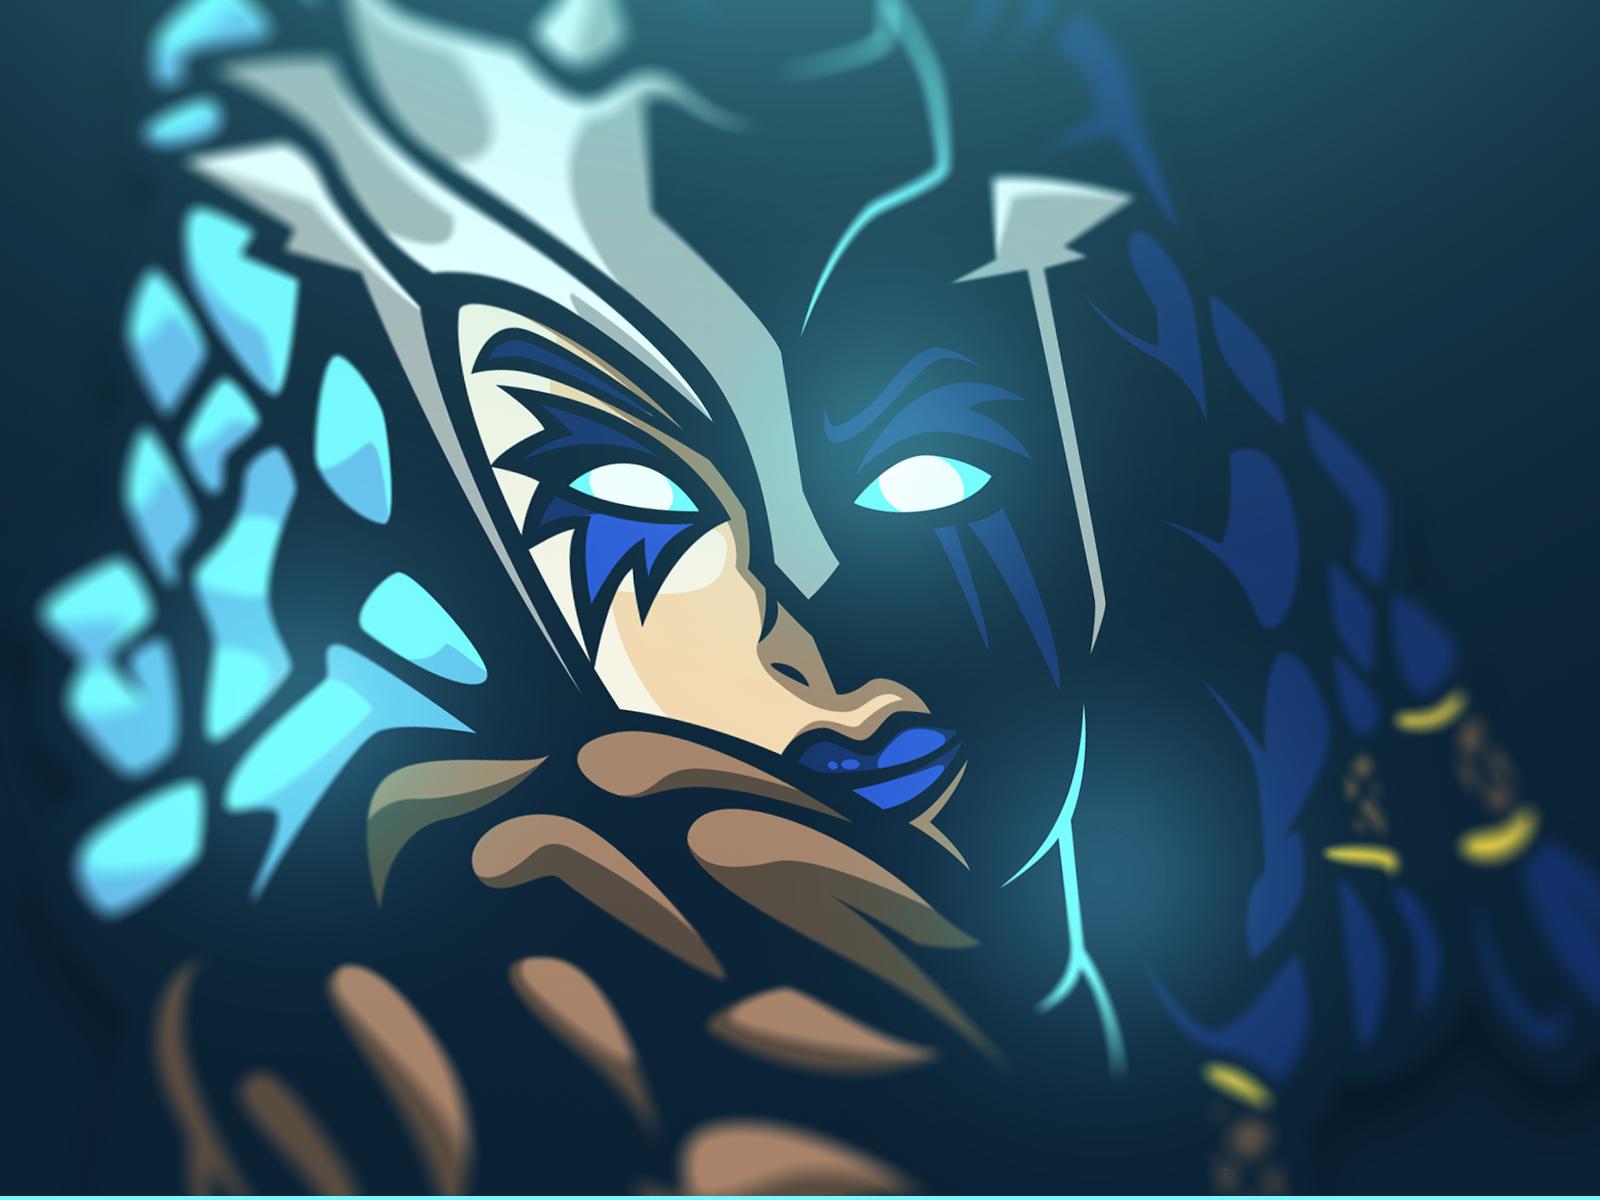 Valkyrie Fortnite Mascot game esport gaming logo laureaux didier illustration mascot valkyrie